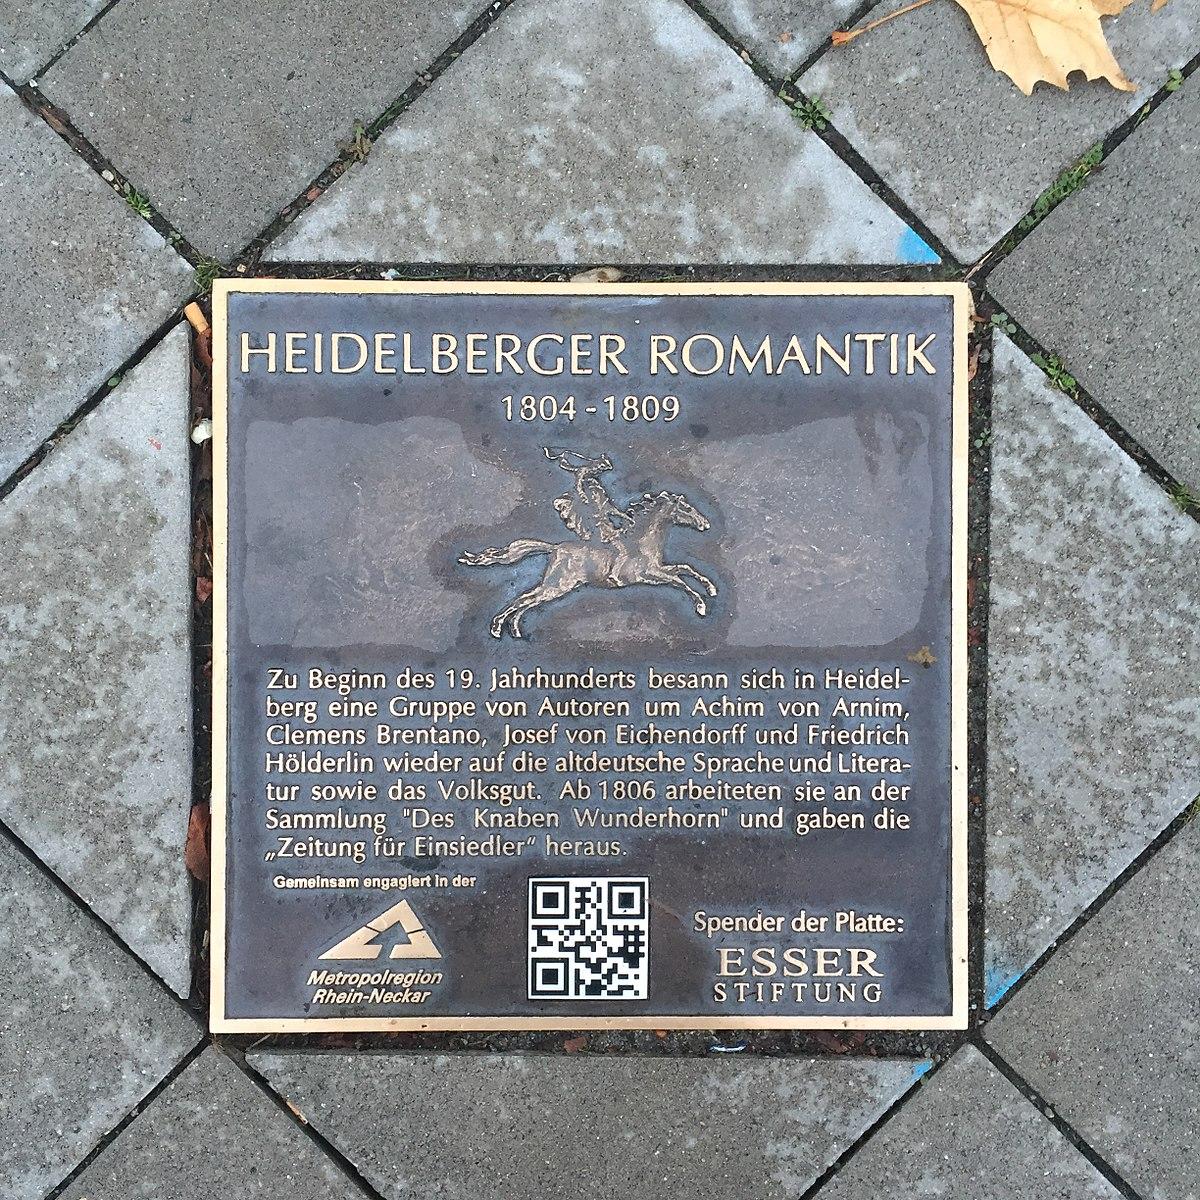 Heidelberger Romantik –